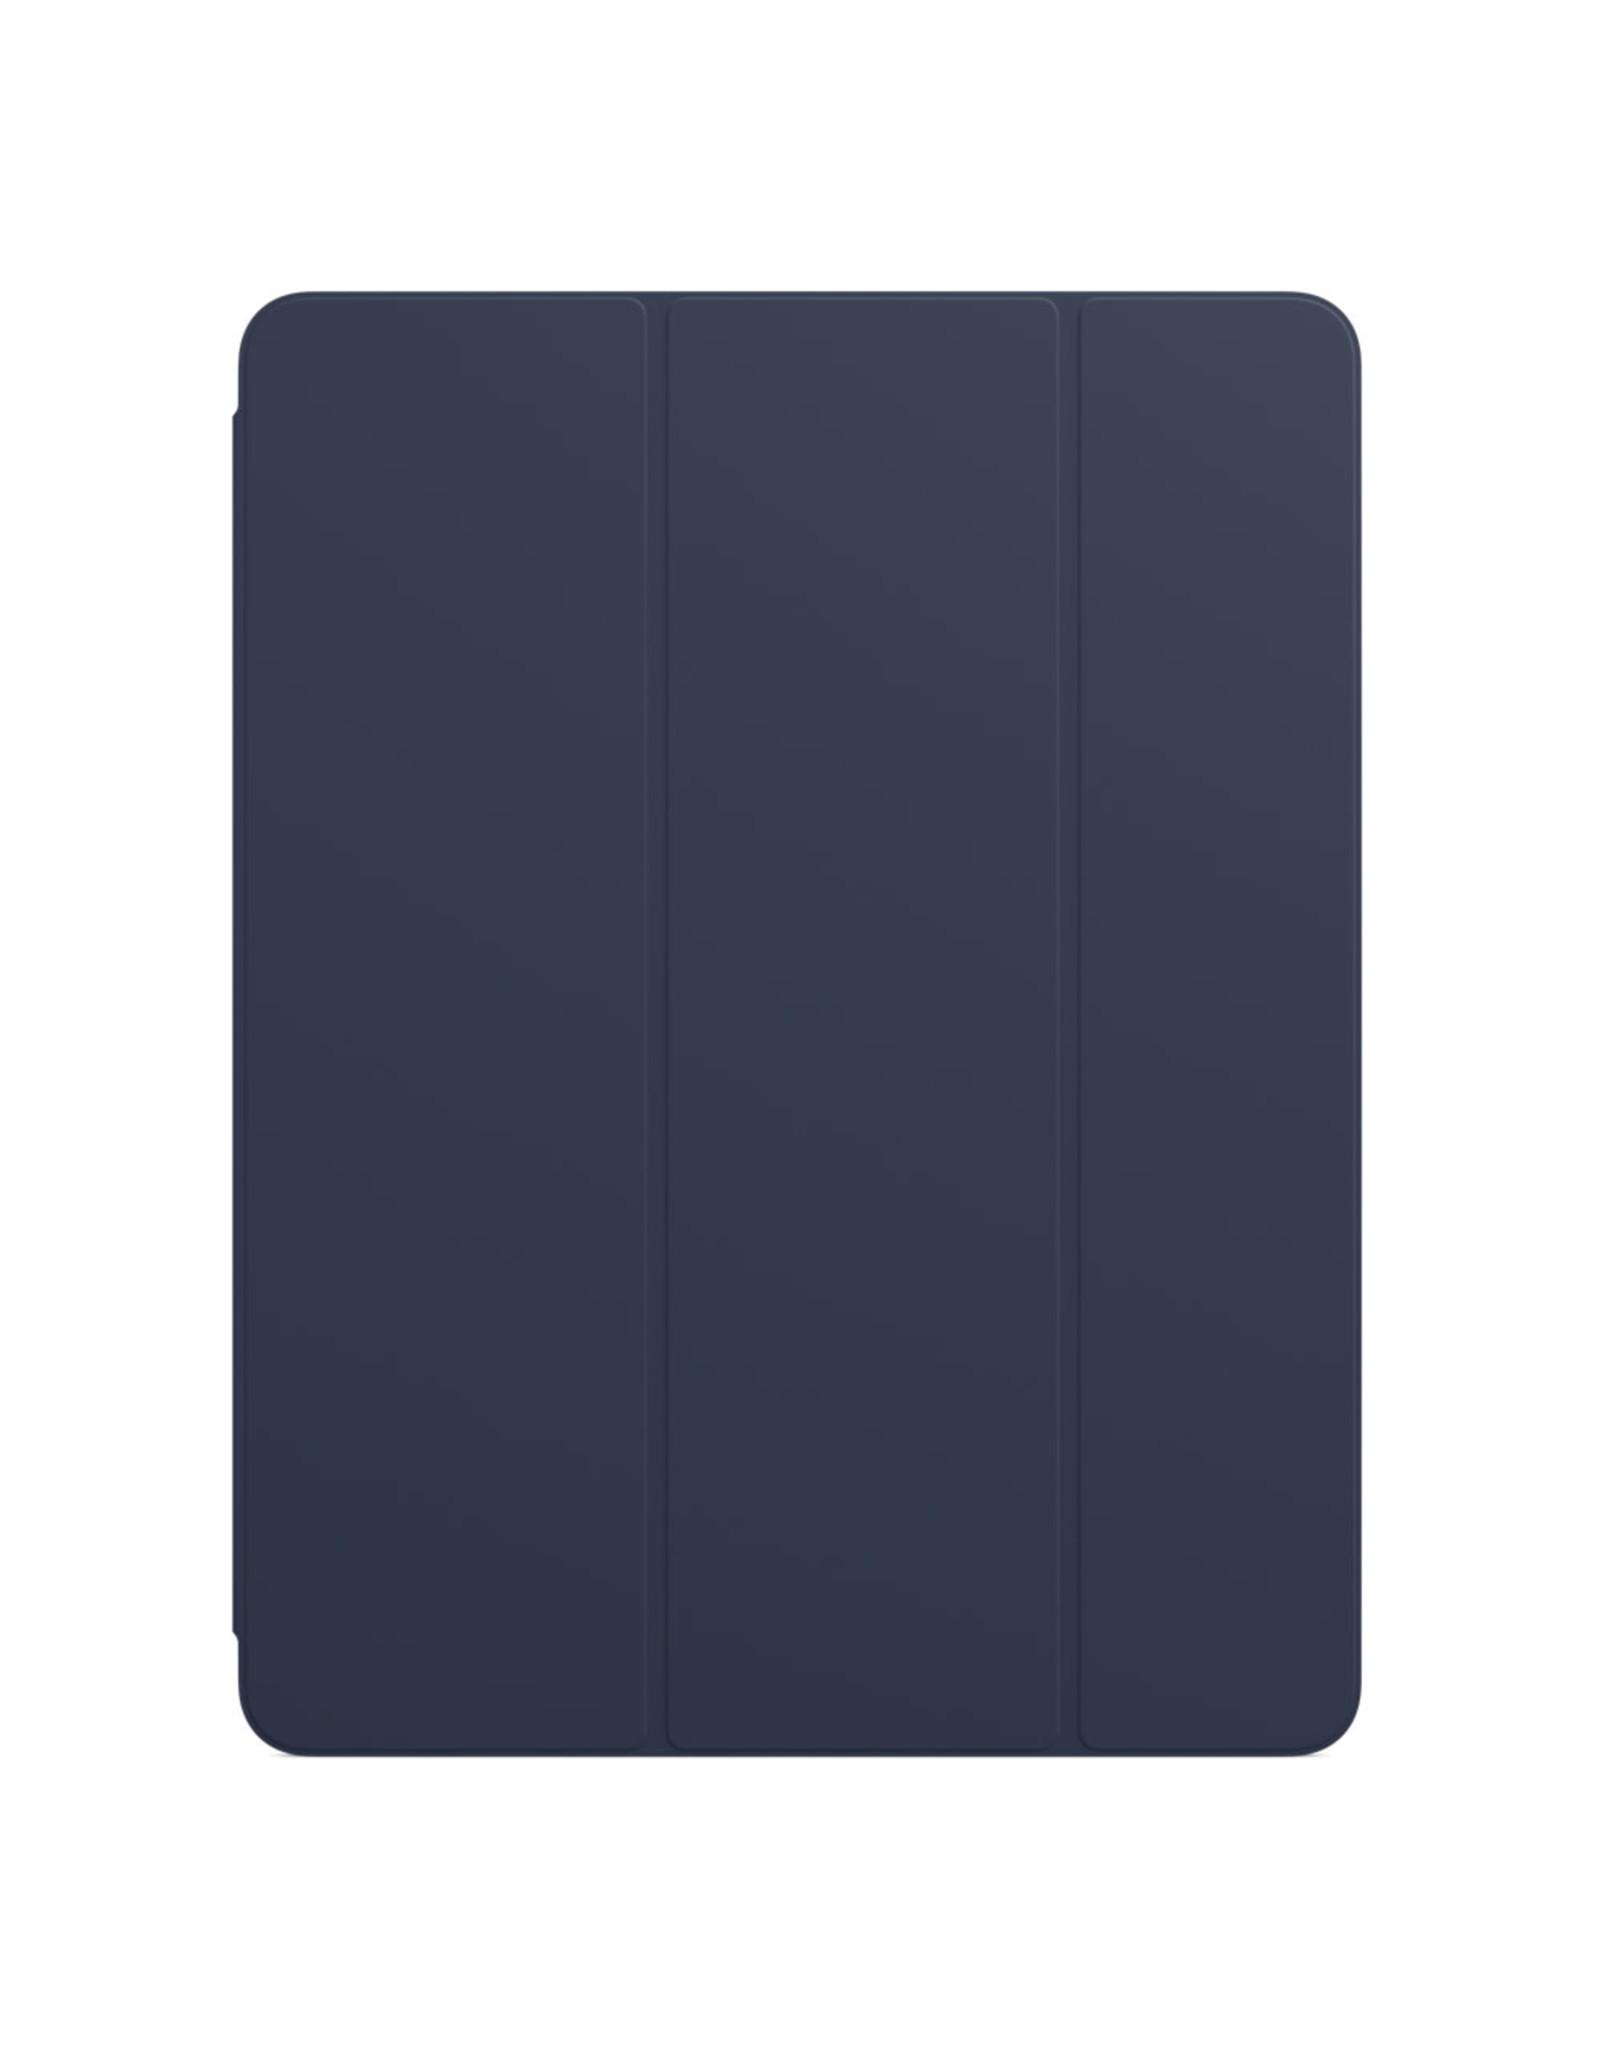 Apple Apple Smart Folio for iPad Pro 12.9-inch (5th generation) - Deep Navy